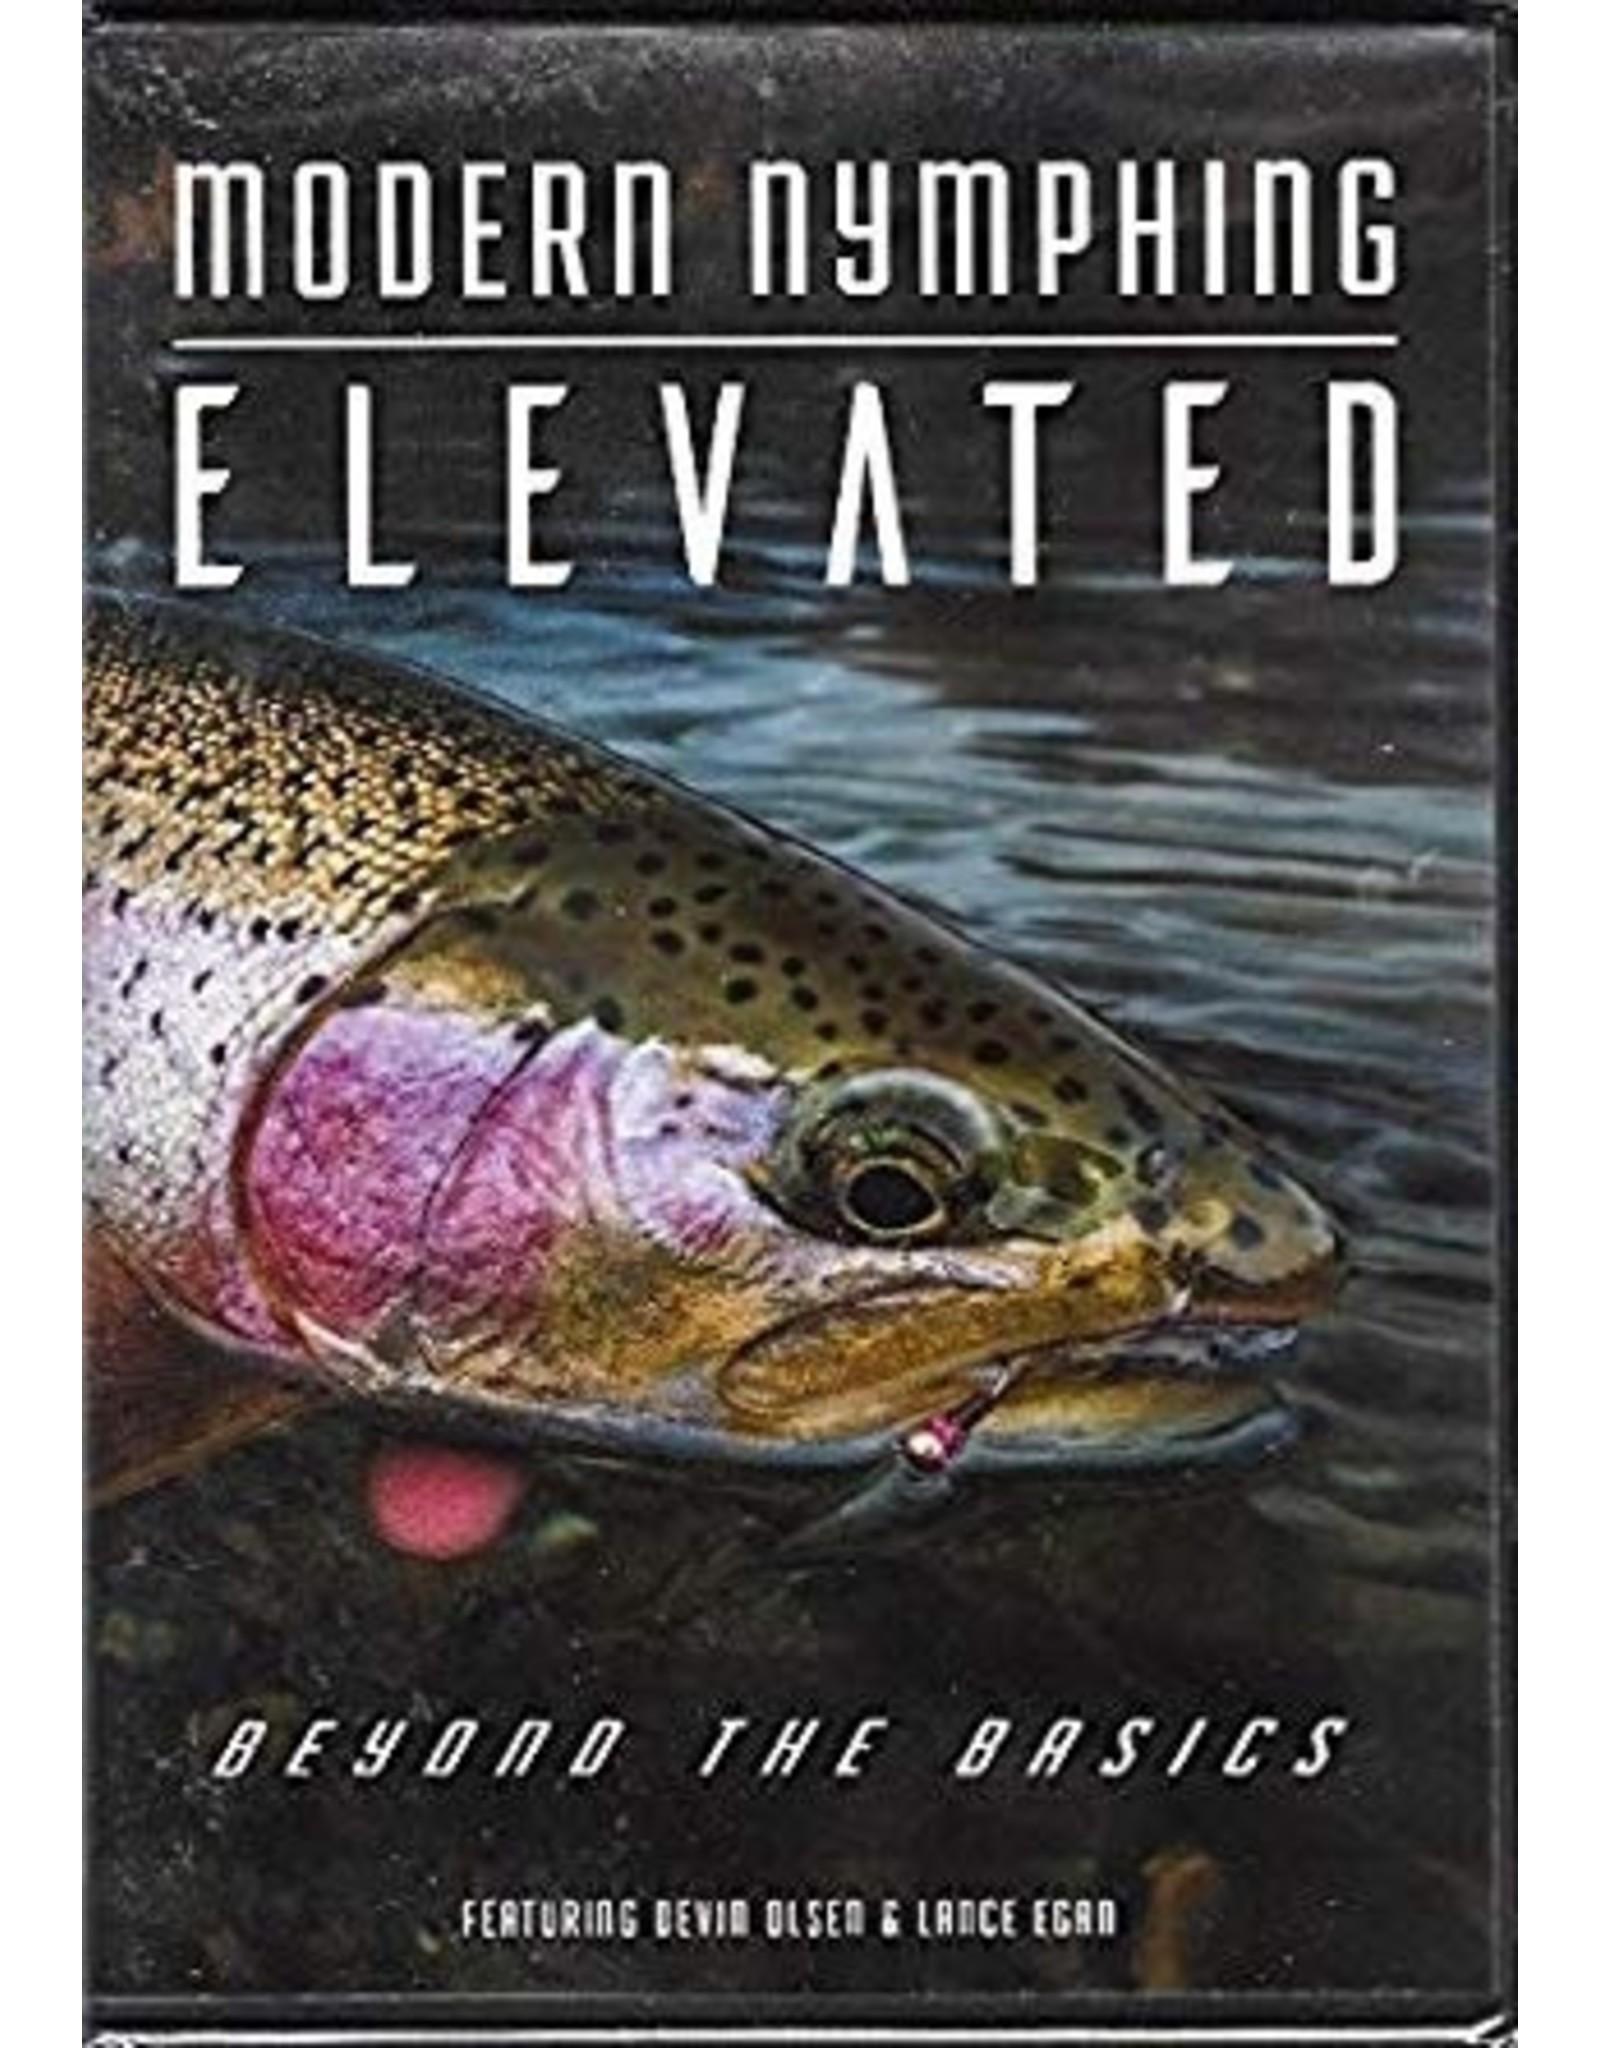 DVD Modern Nymphing Elevated, Devin Olsen & Lance Egan